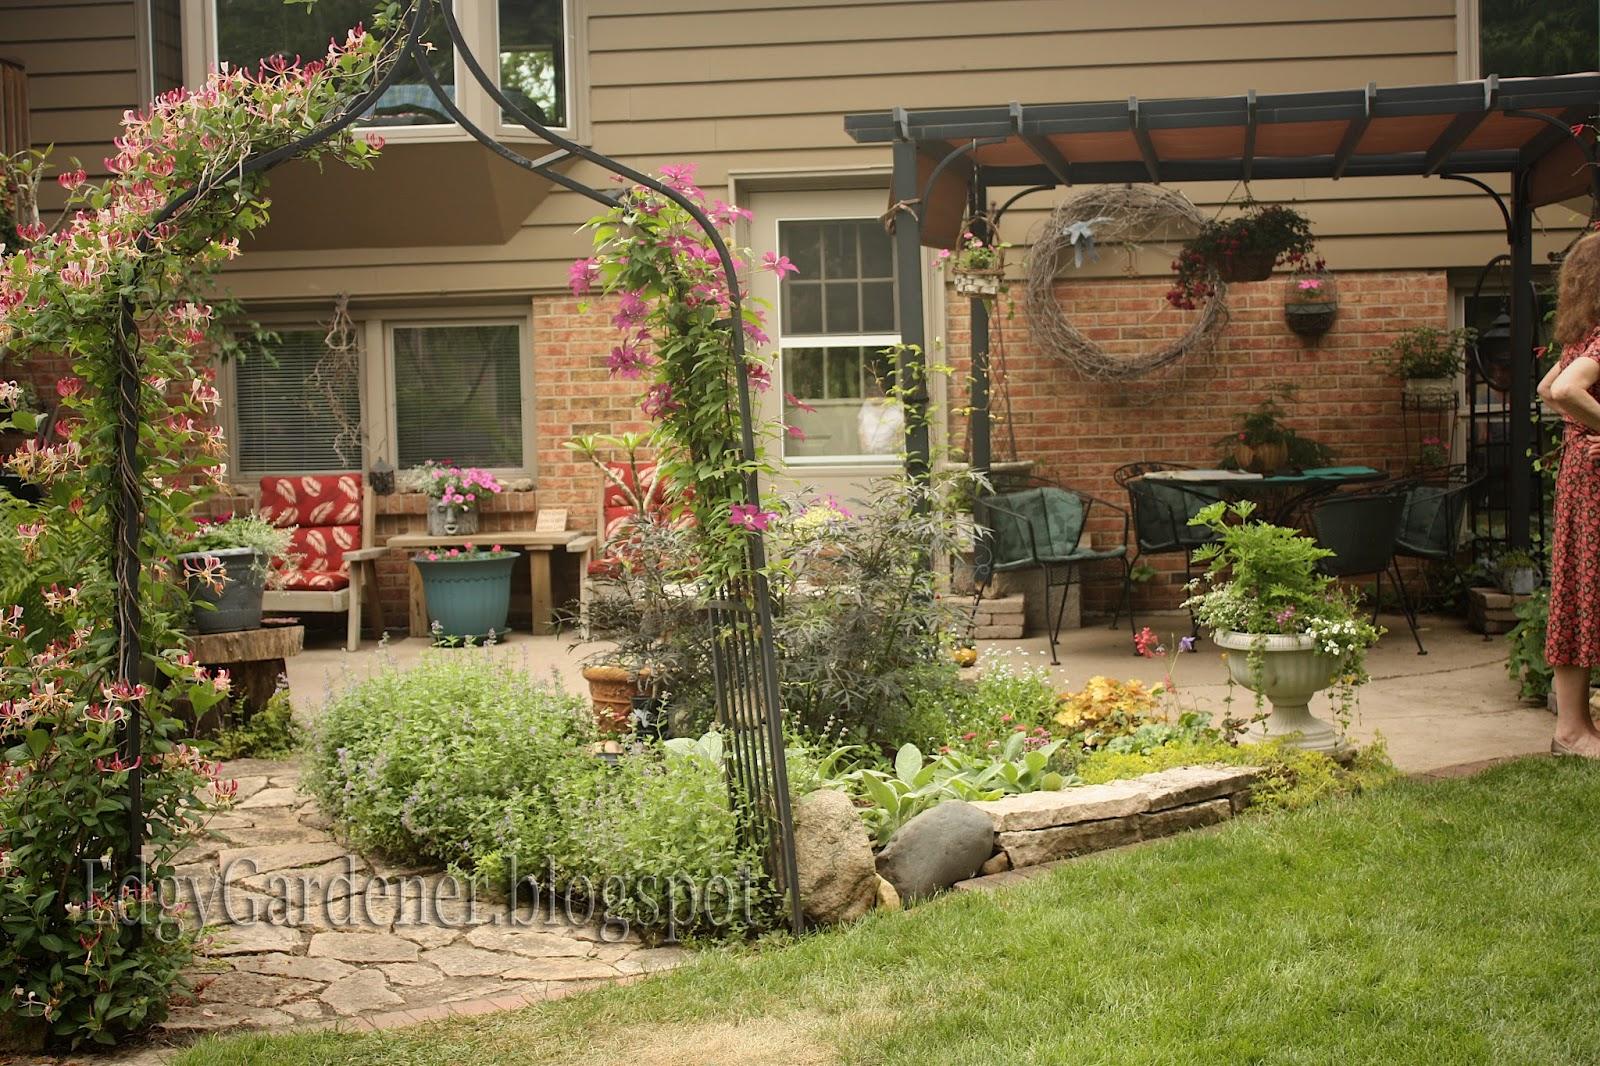 The Edgy Gardener Blog: Garden Walk: Rockford, Il (Post 5